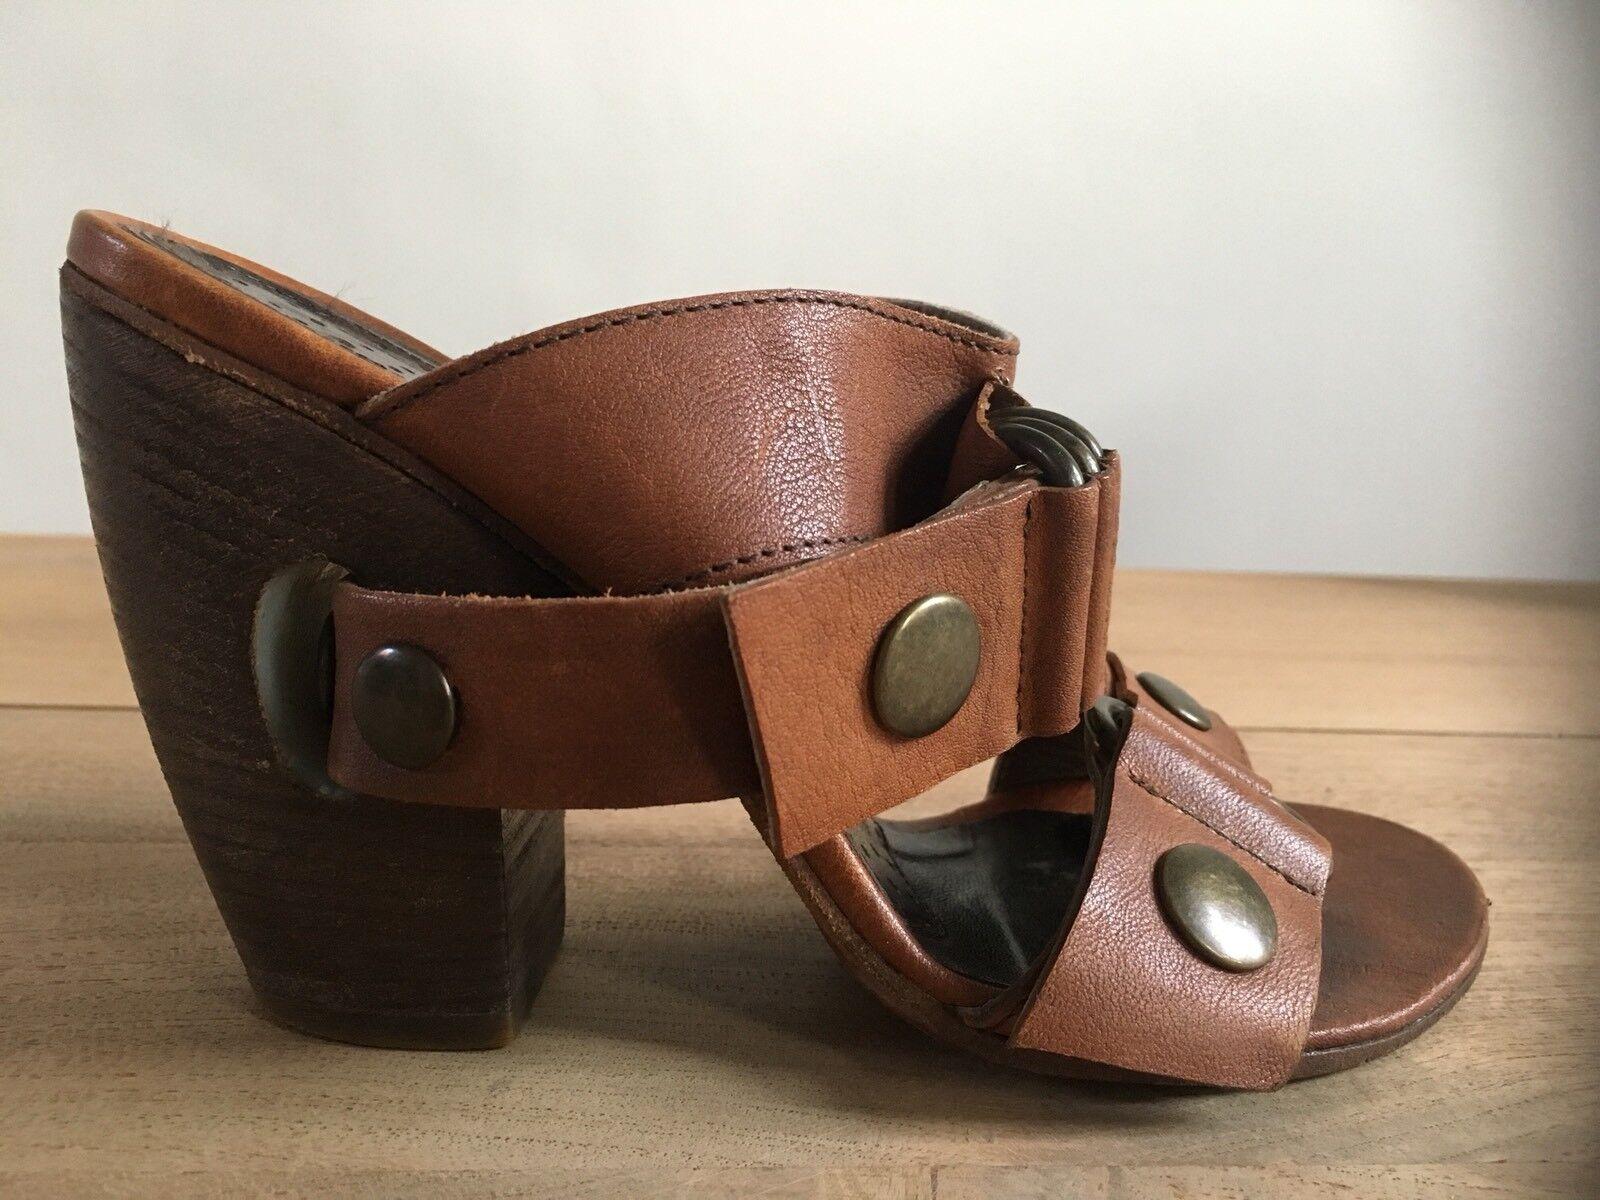 Orig. ELISANERO Pantoletten Flip Flop Schuhe Sandale Gr.36 OVP NP